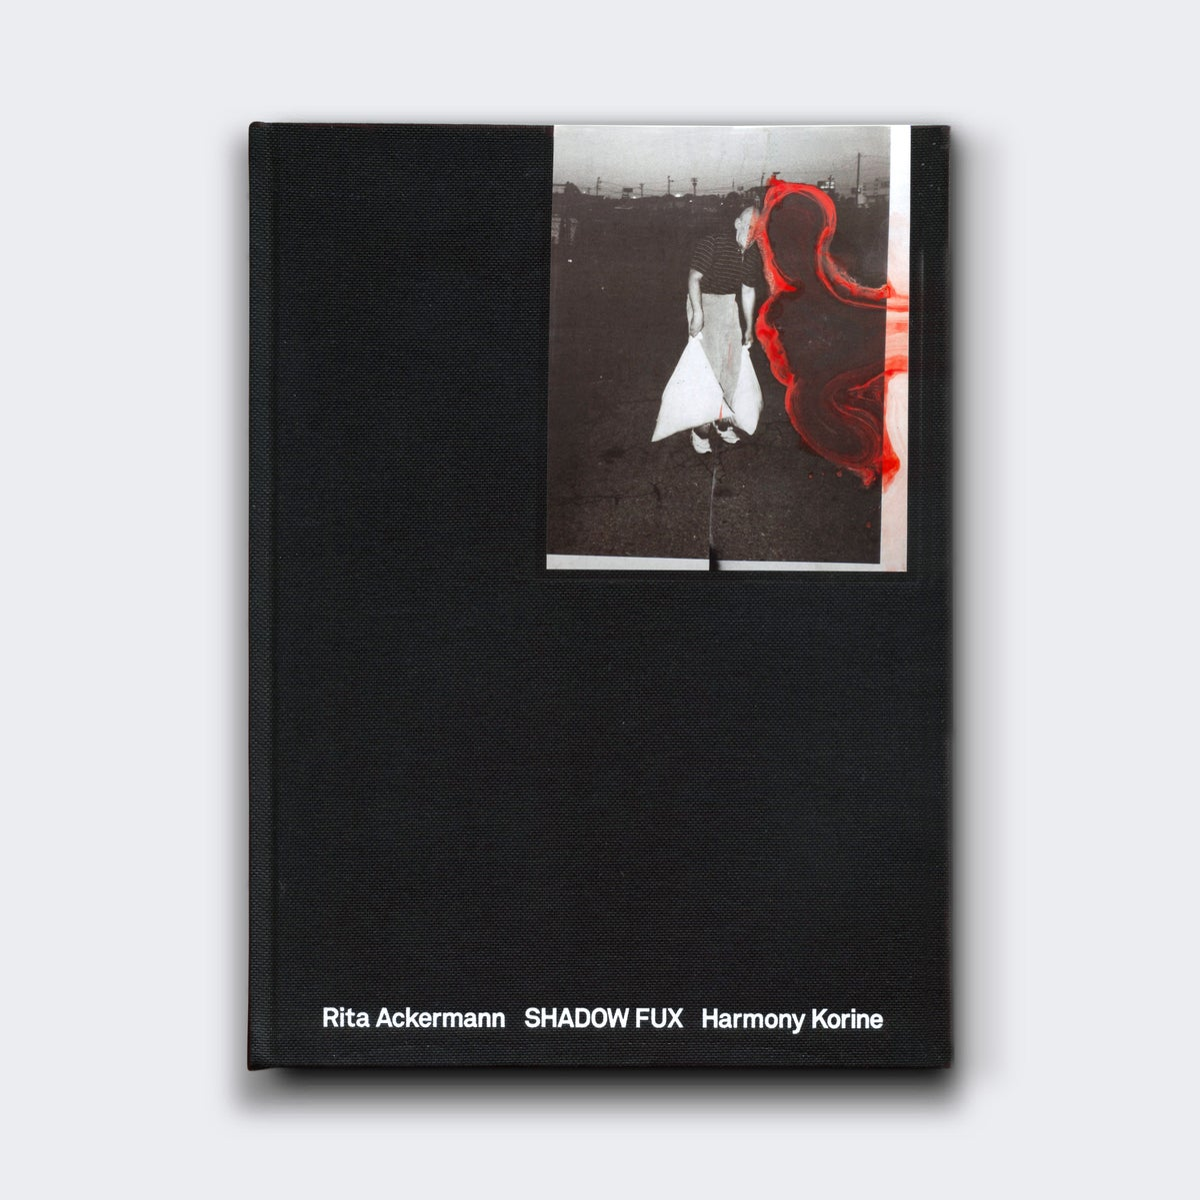 RITA ACKERMANN & HARMONY KORINE - SHADOWFUX